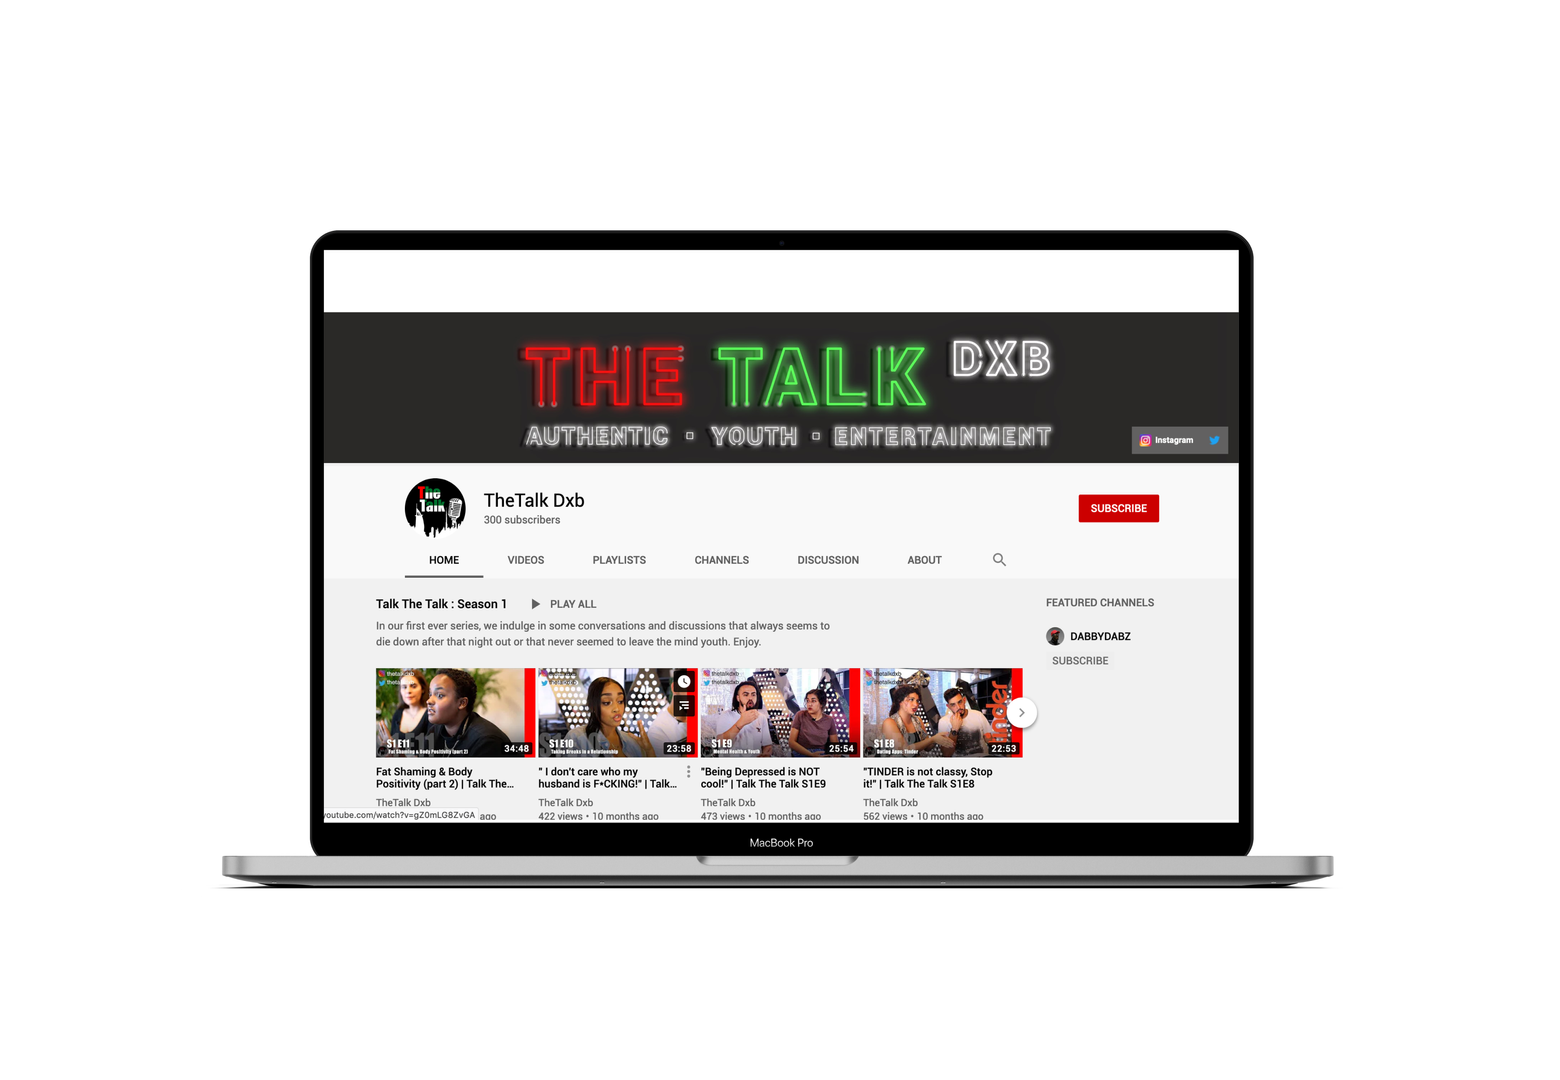 The TalkDXB